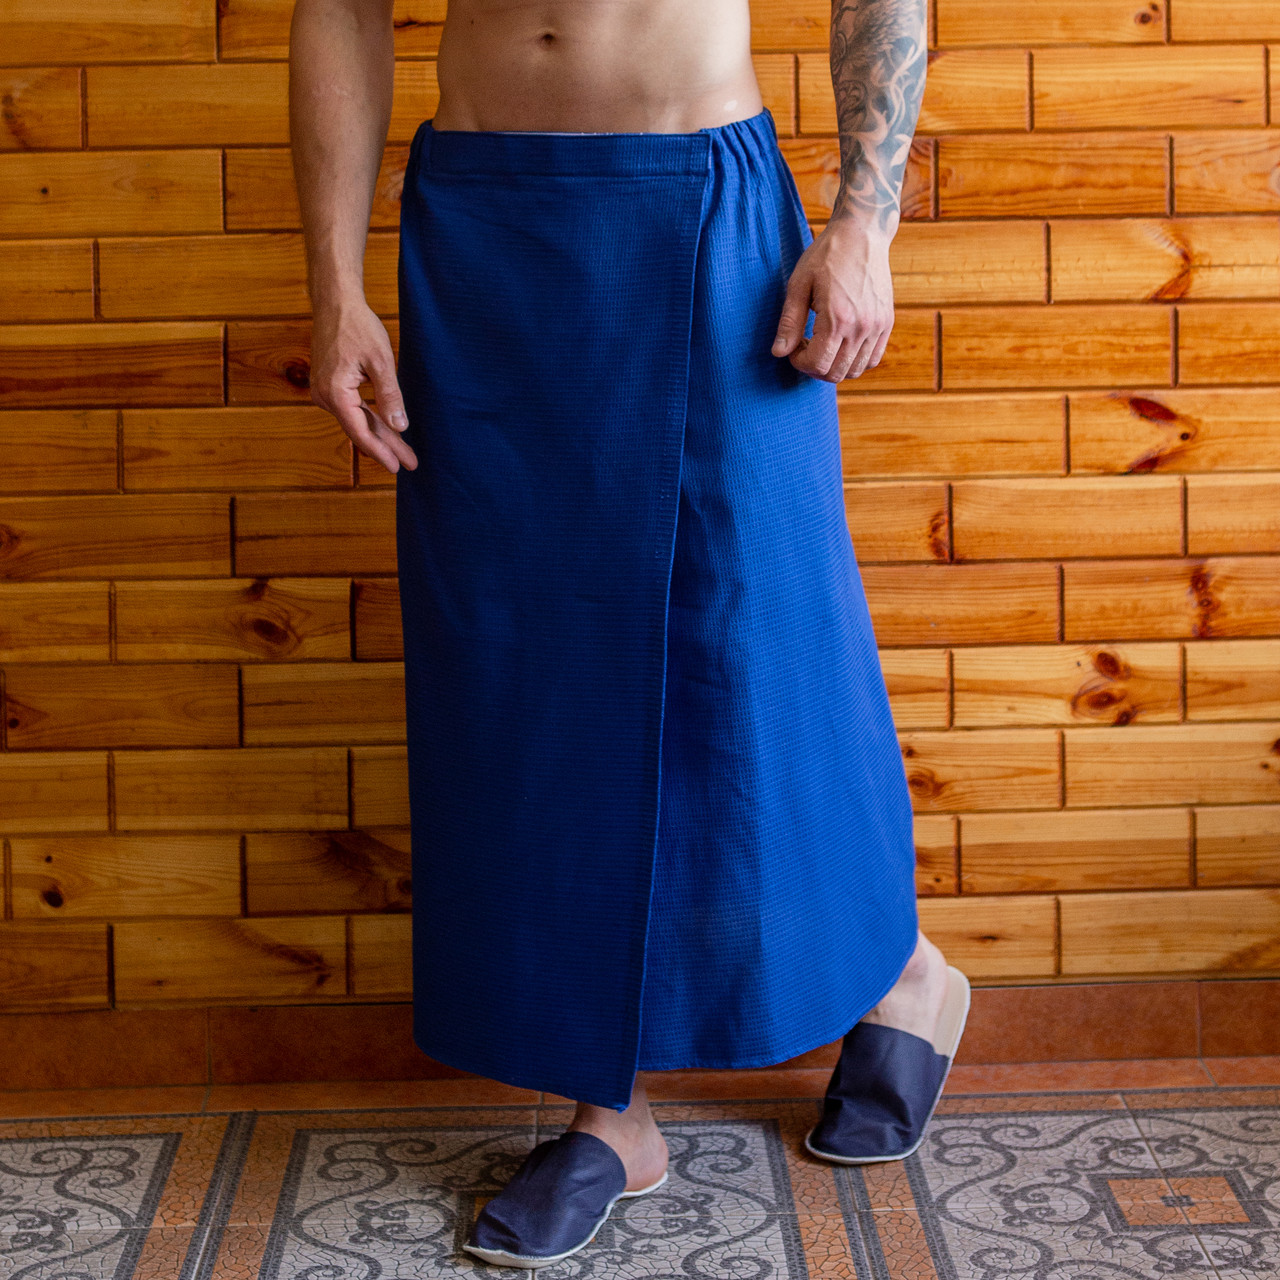 Полотенце (килт-парео) вафельное 75х150 см синий